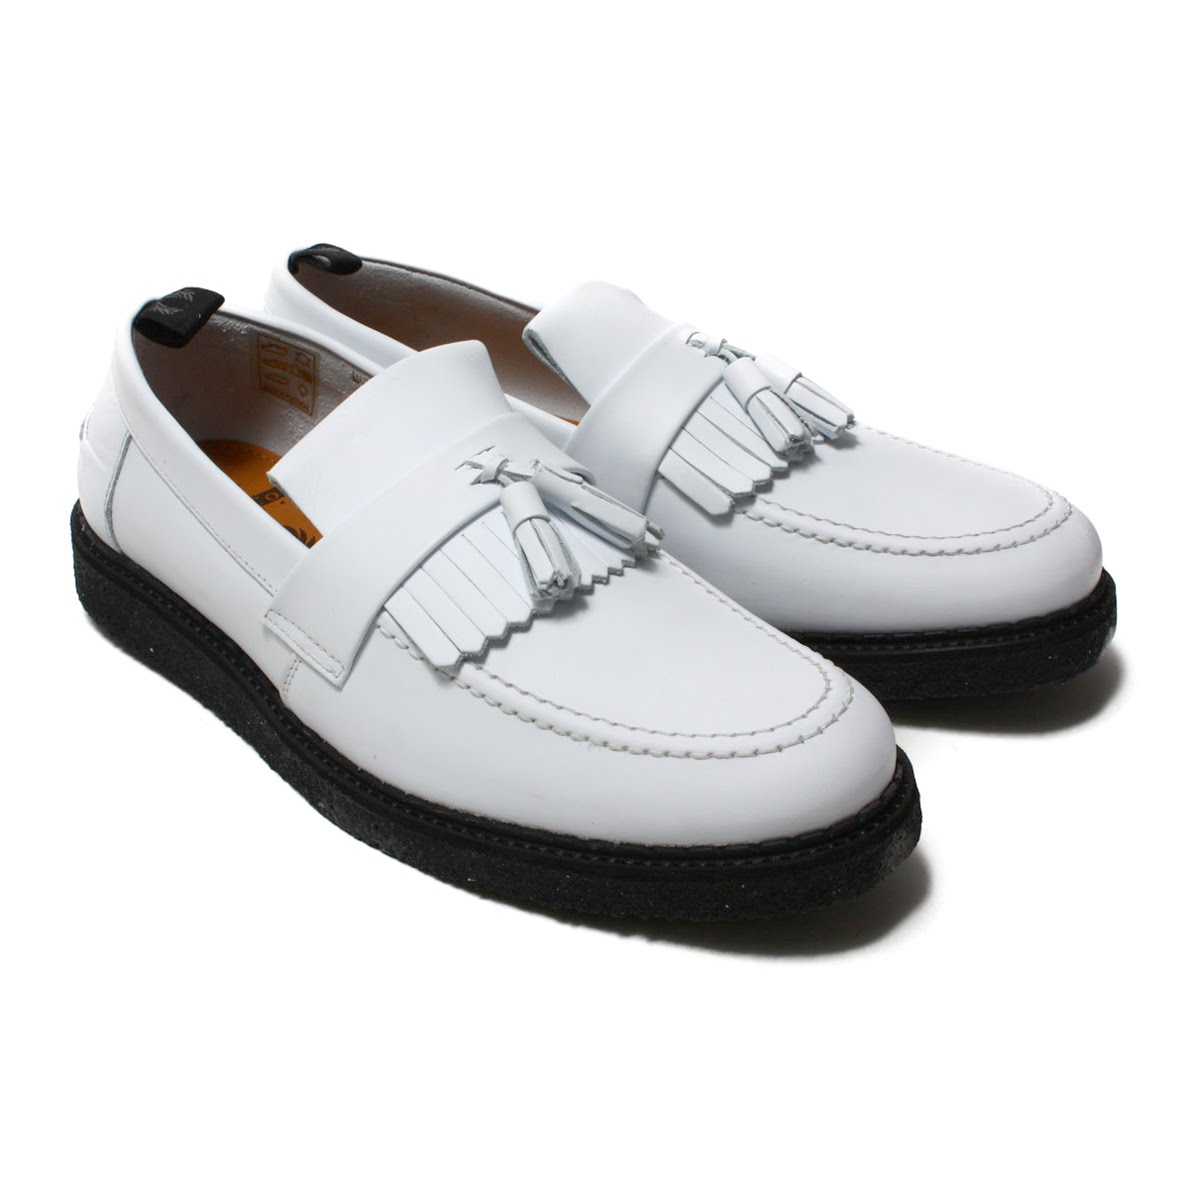 FRED PERRY X George Cox Tassel Loafer Leather(フレッドペリー タッセル ローファー レザー)WHITE【メンズ レディース スニーカー】18SP-I